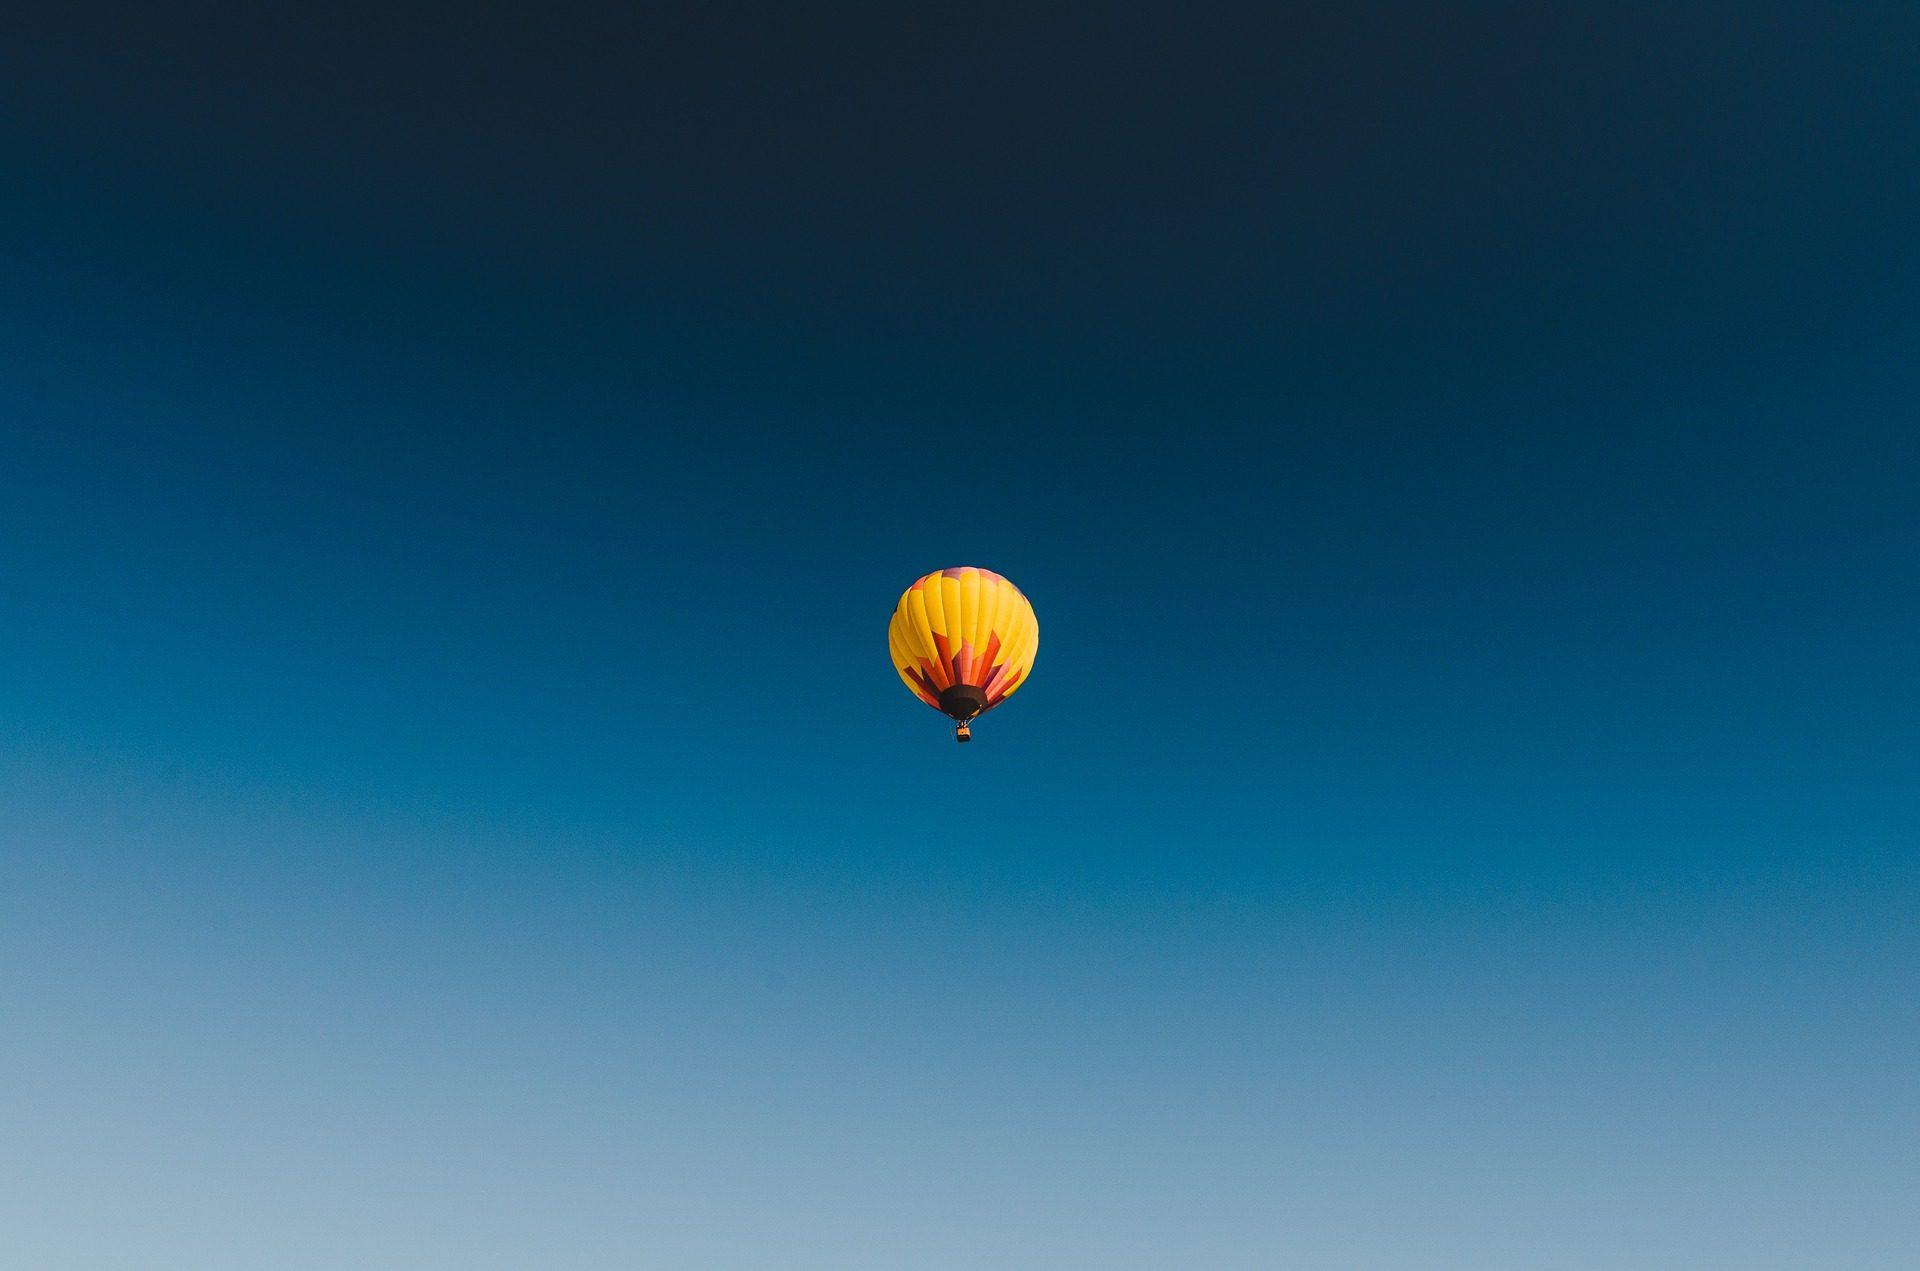 globo, aerostático, cielo, alturas, volar - Fondos de Pantalla HD - professor-falken.com